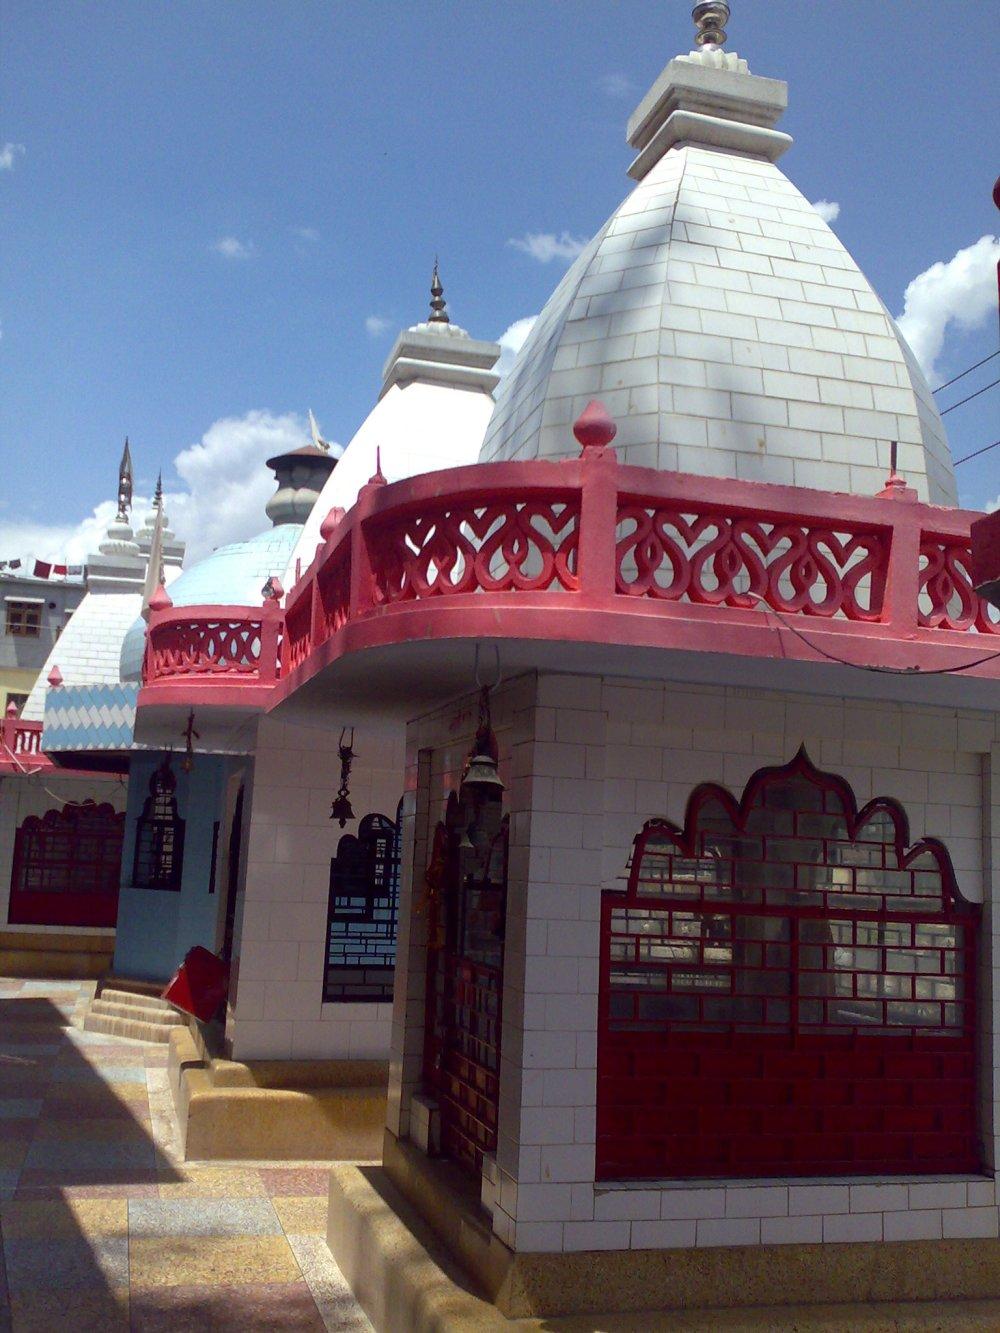 A beautiful Temple complex, Baijnath,Uttarakhand, India